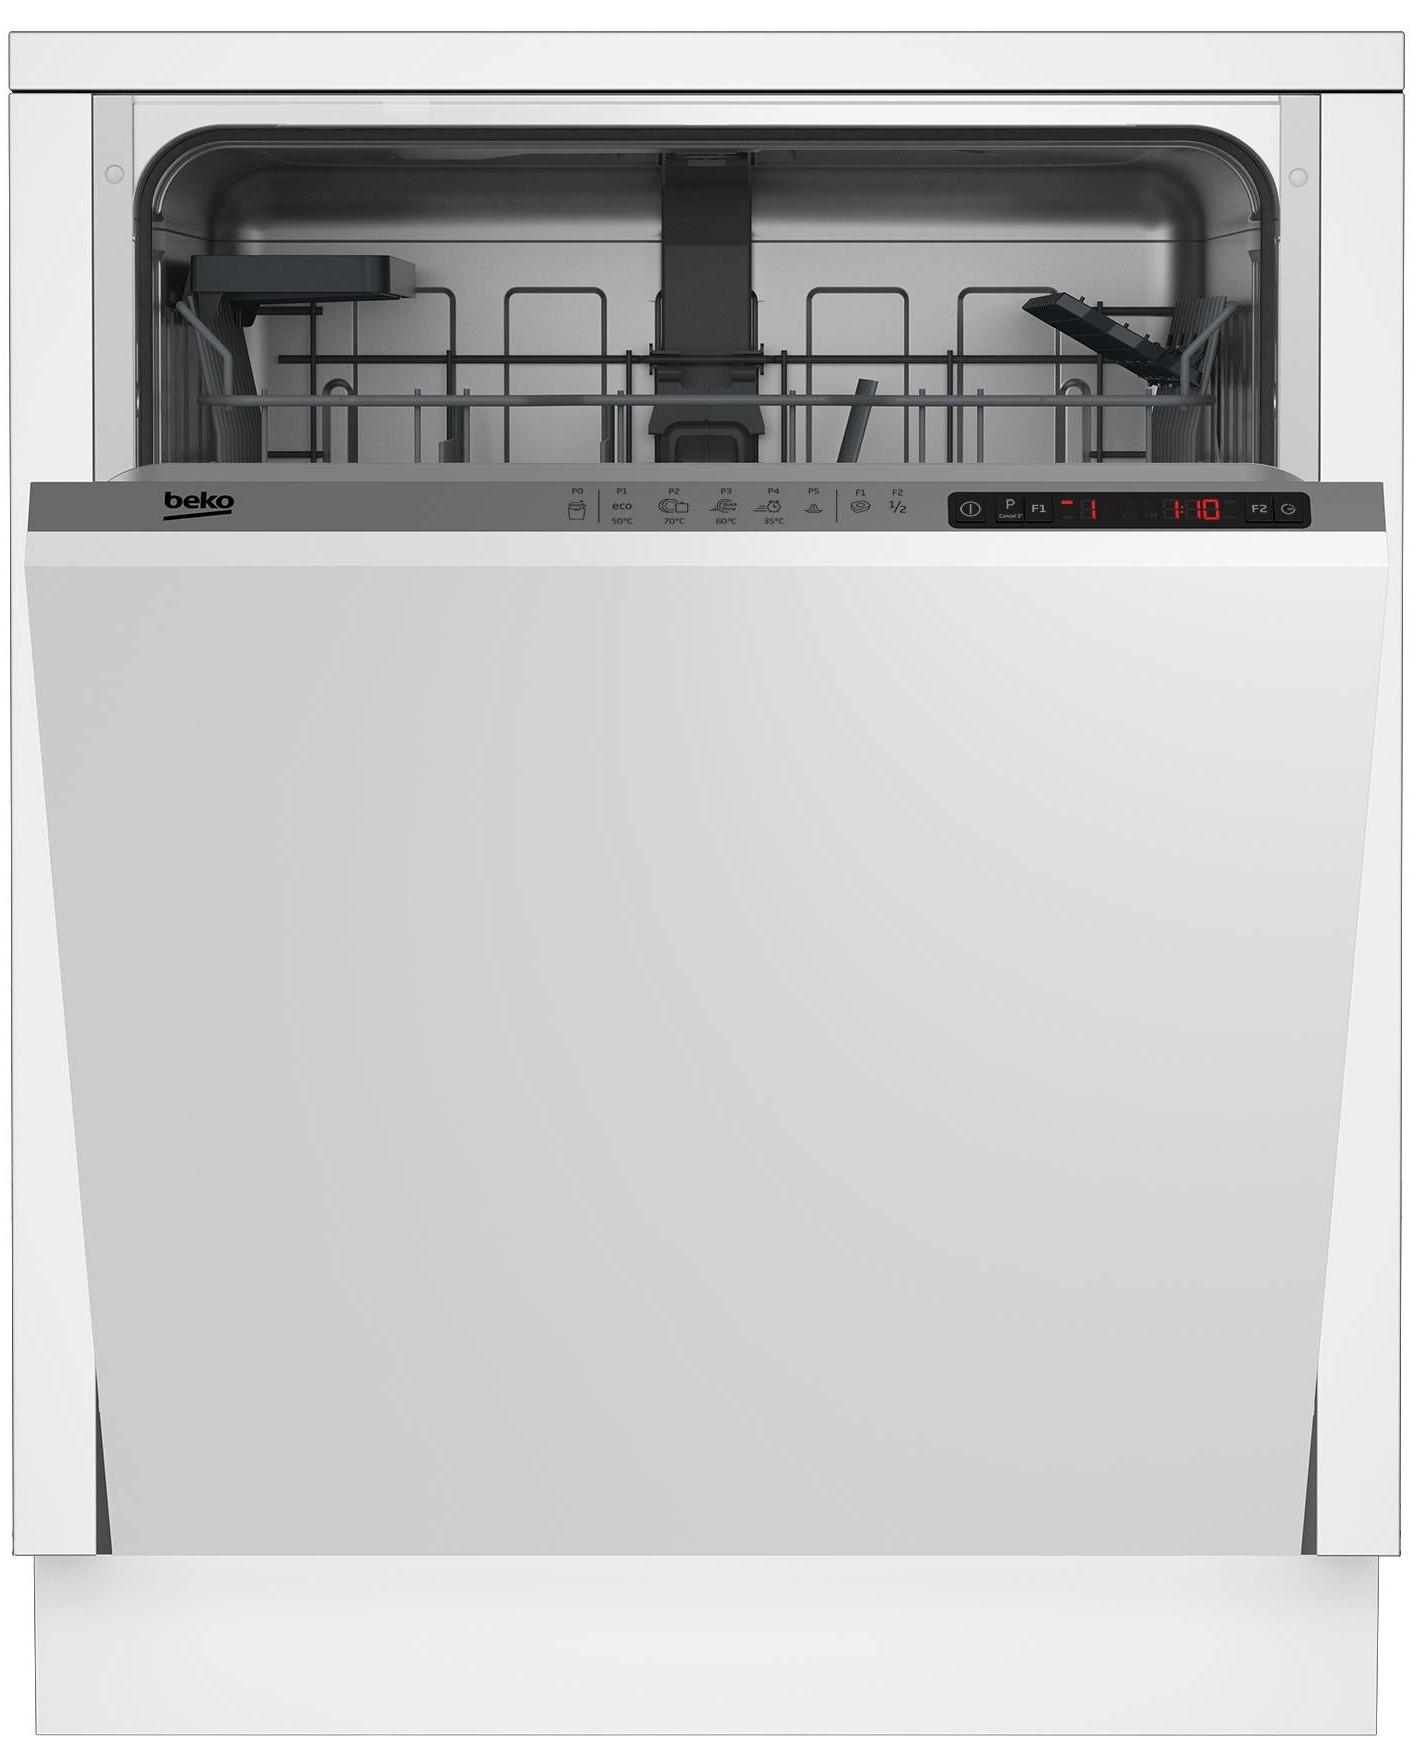 Masina de spalat vase incorporabila Beko DIN25310, 13 Seturi, Silver, A